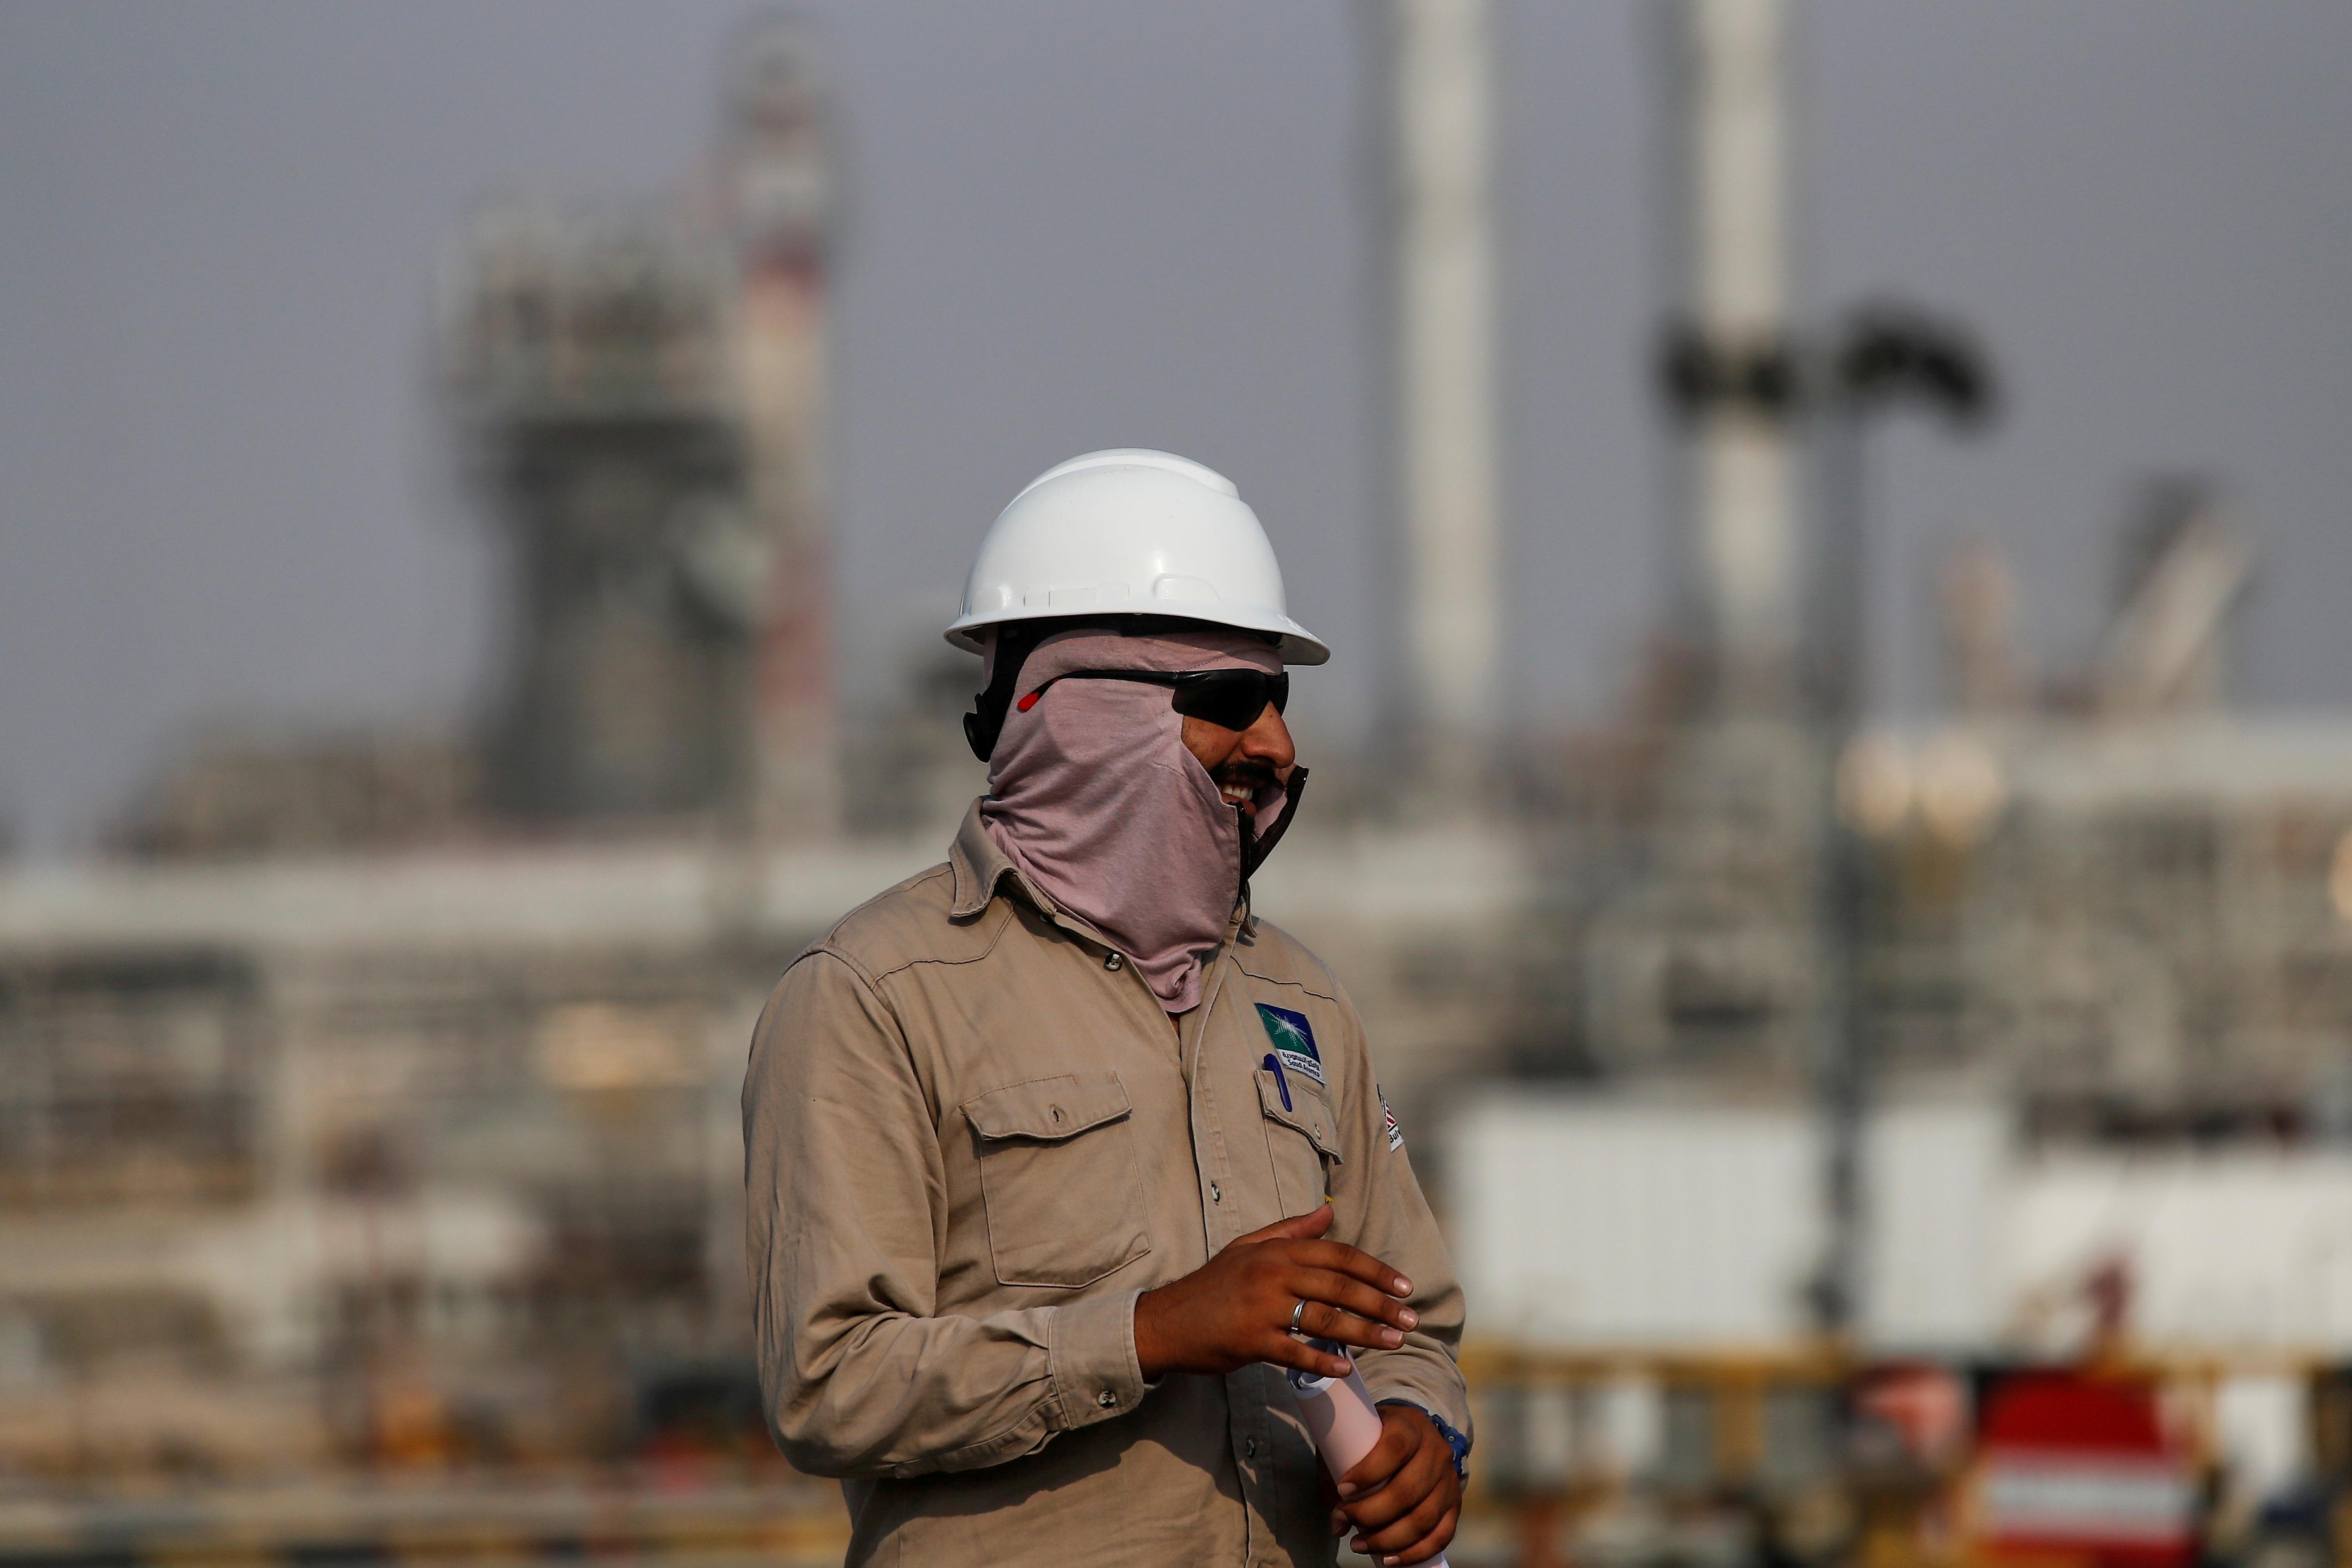 An employee looks on at Saudi Aramco oil facility in Abqaiq, Saudi Arabia October 12, 2019. REUTERS/Maxim Shemetov